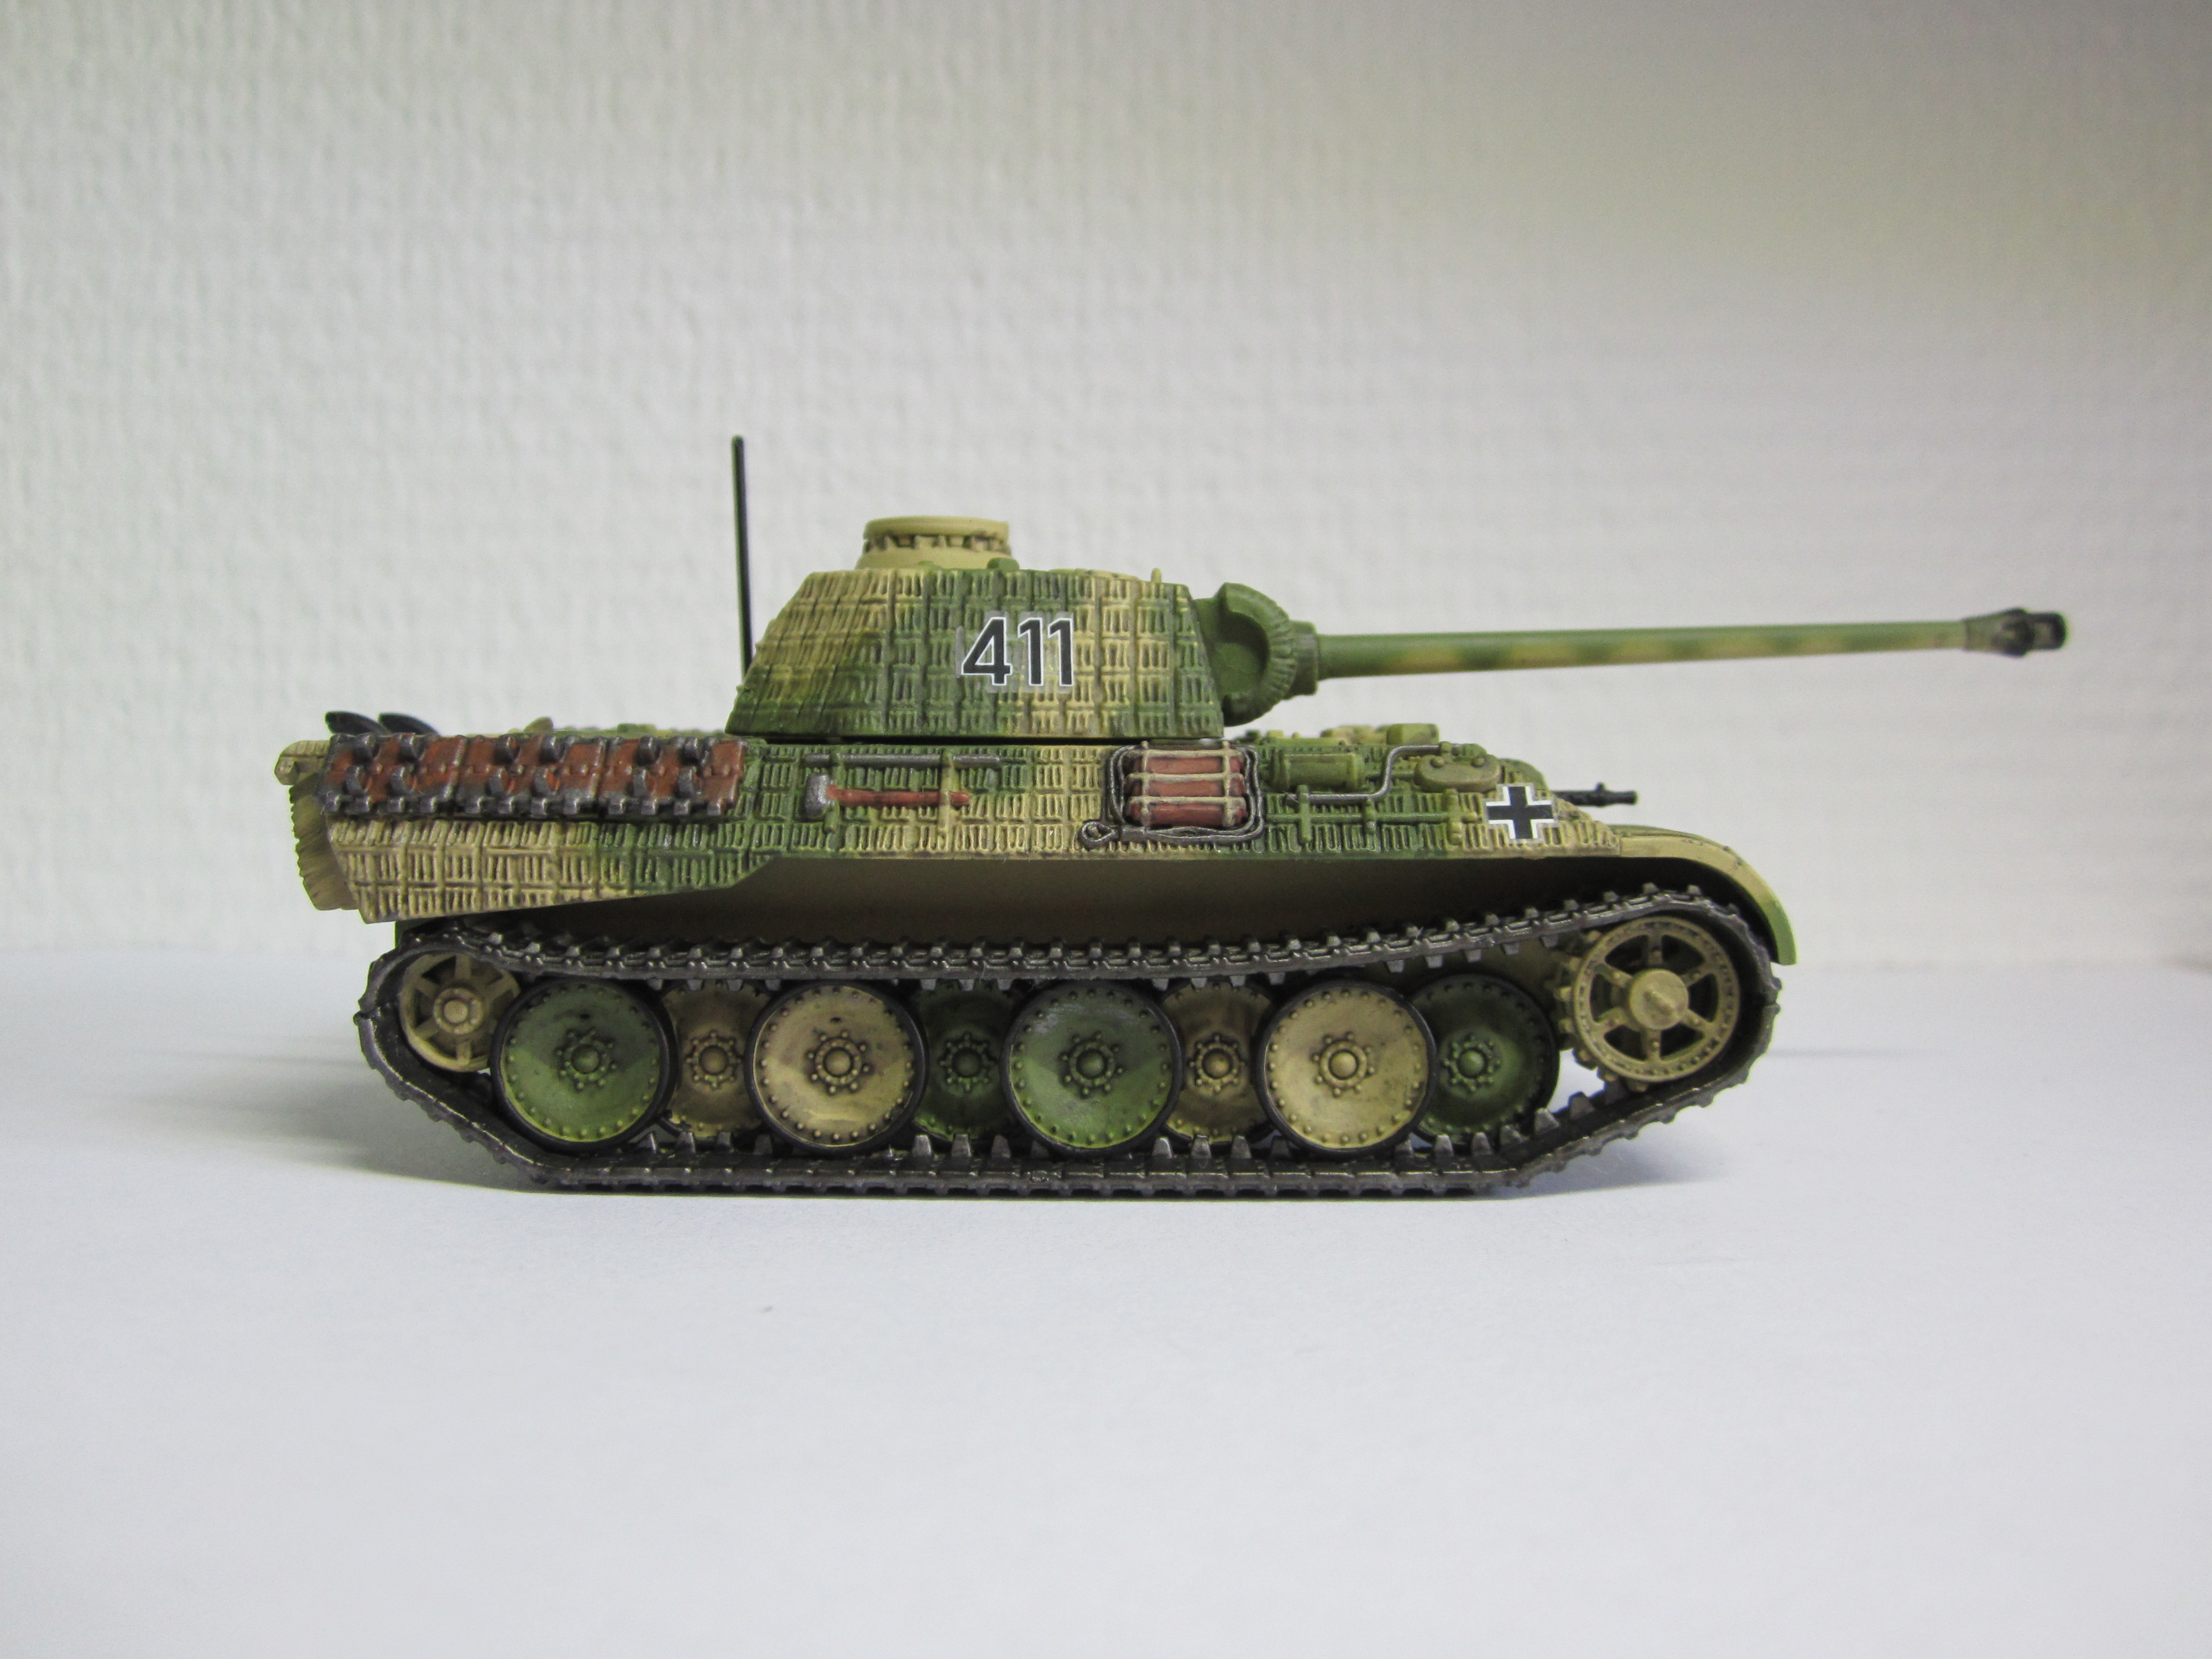 Figuren KöniG's Panzer Lehr Division - Seite 4 Img_3843ses16